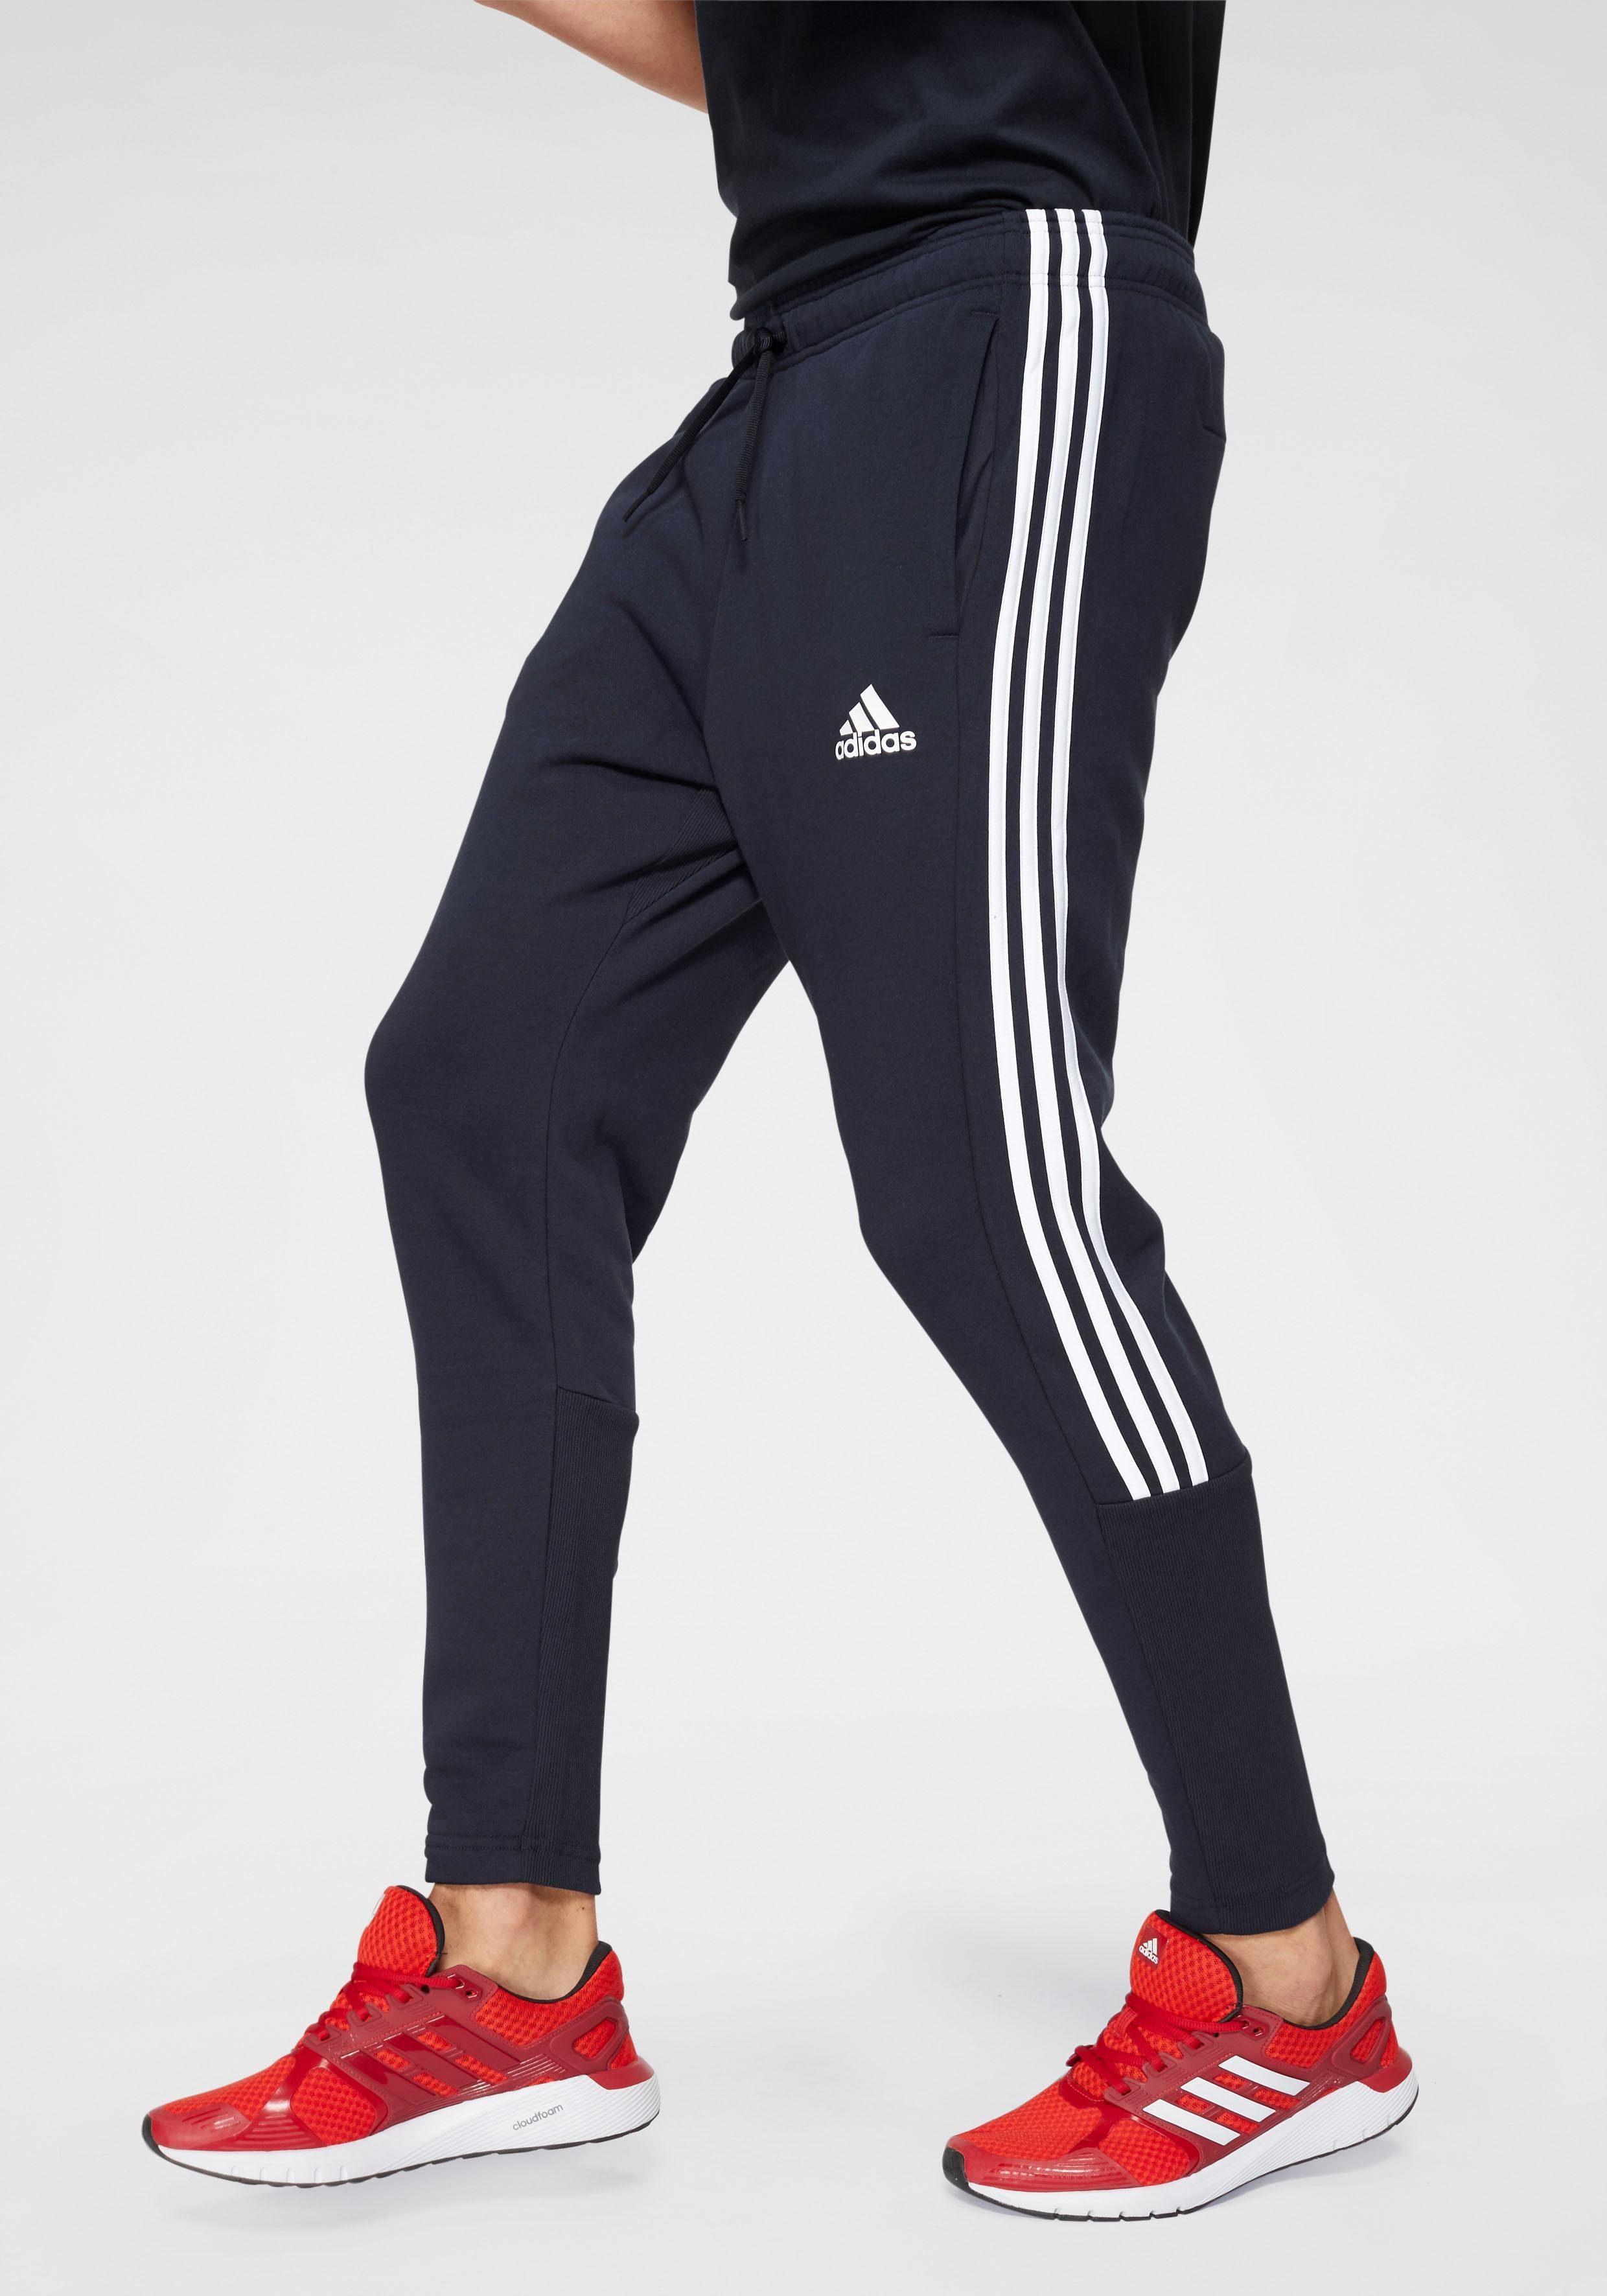 adidas Performance Jogginghose »MH 3 STRIPES TIRO PANT FT« online kaufen   OTTO